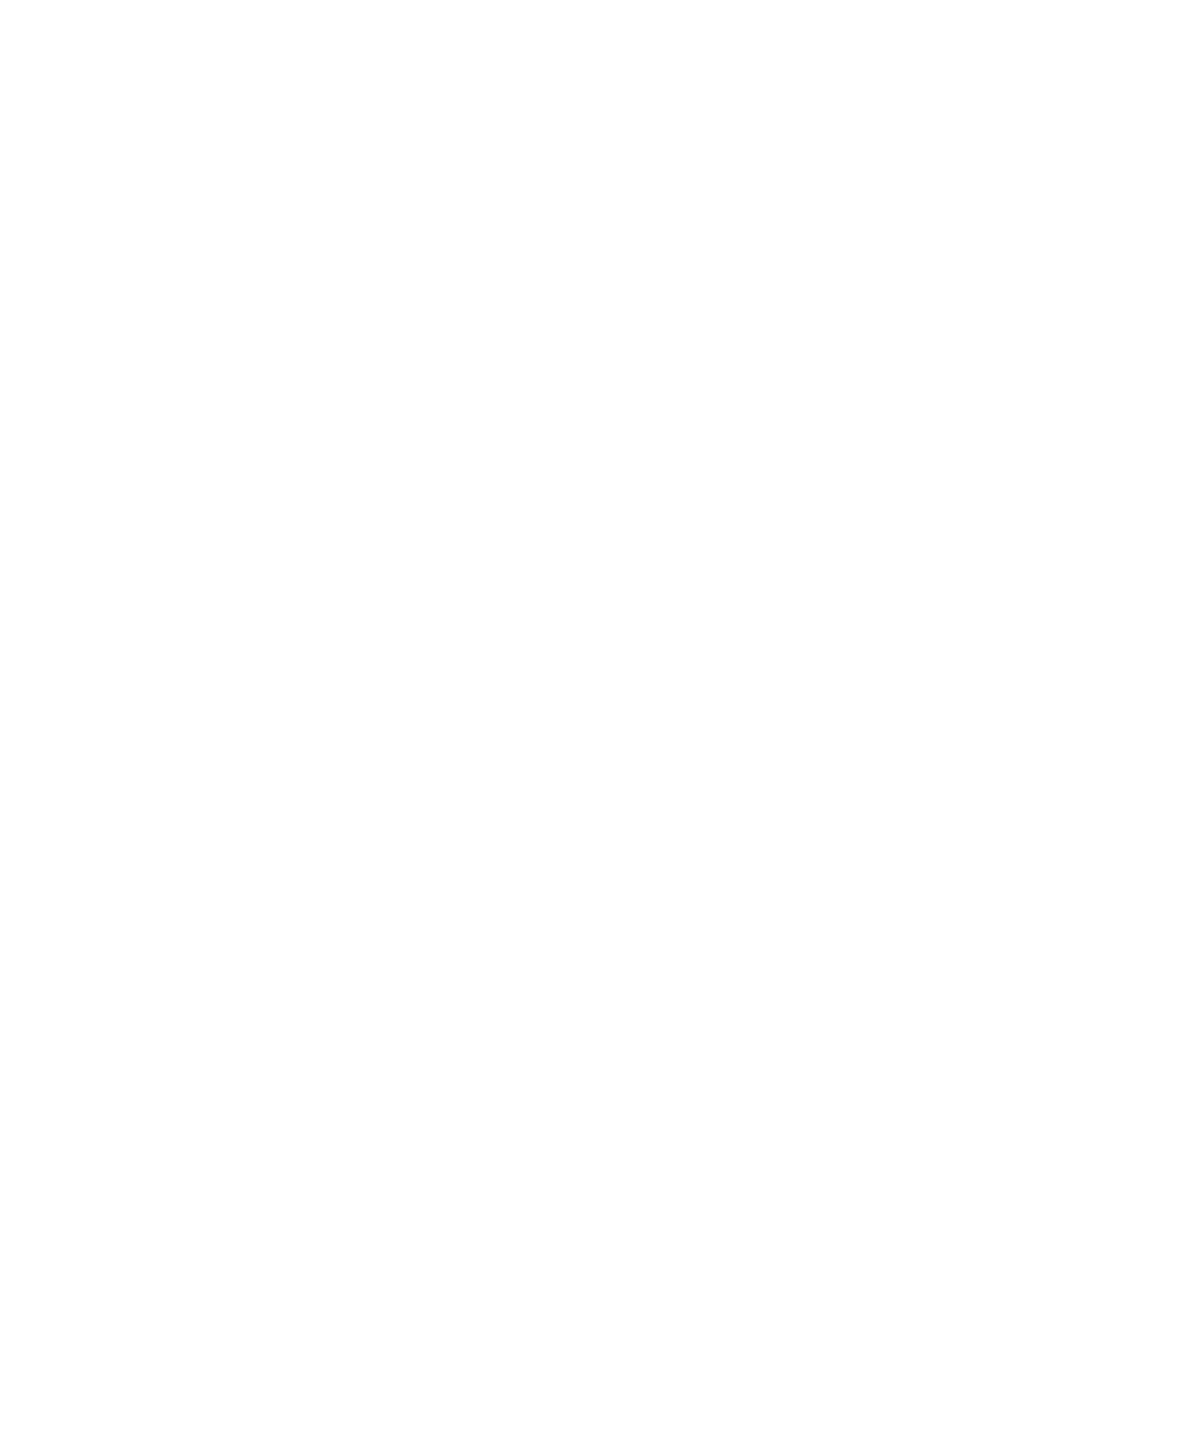 G225 Drawing